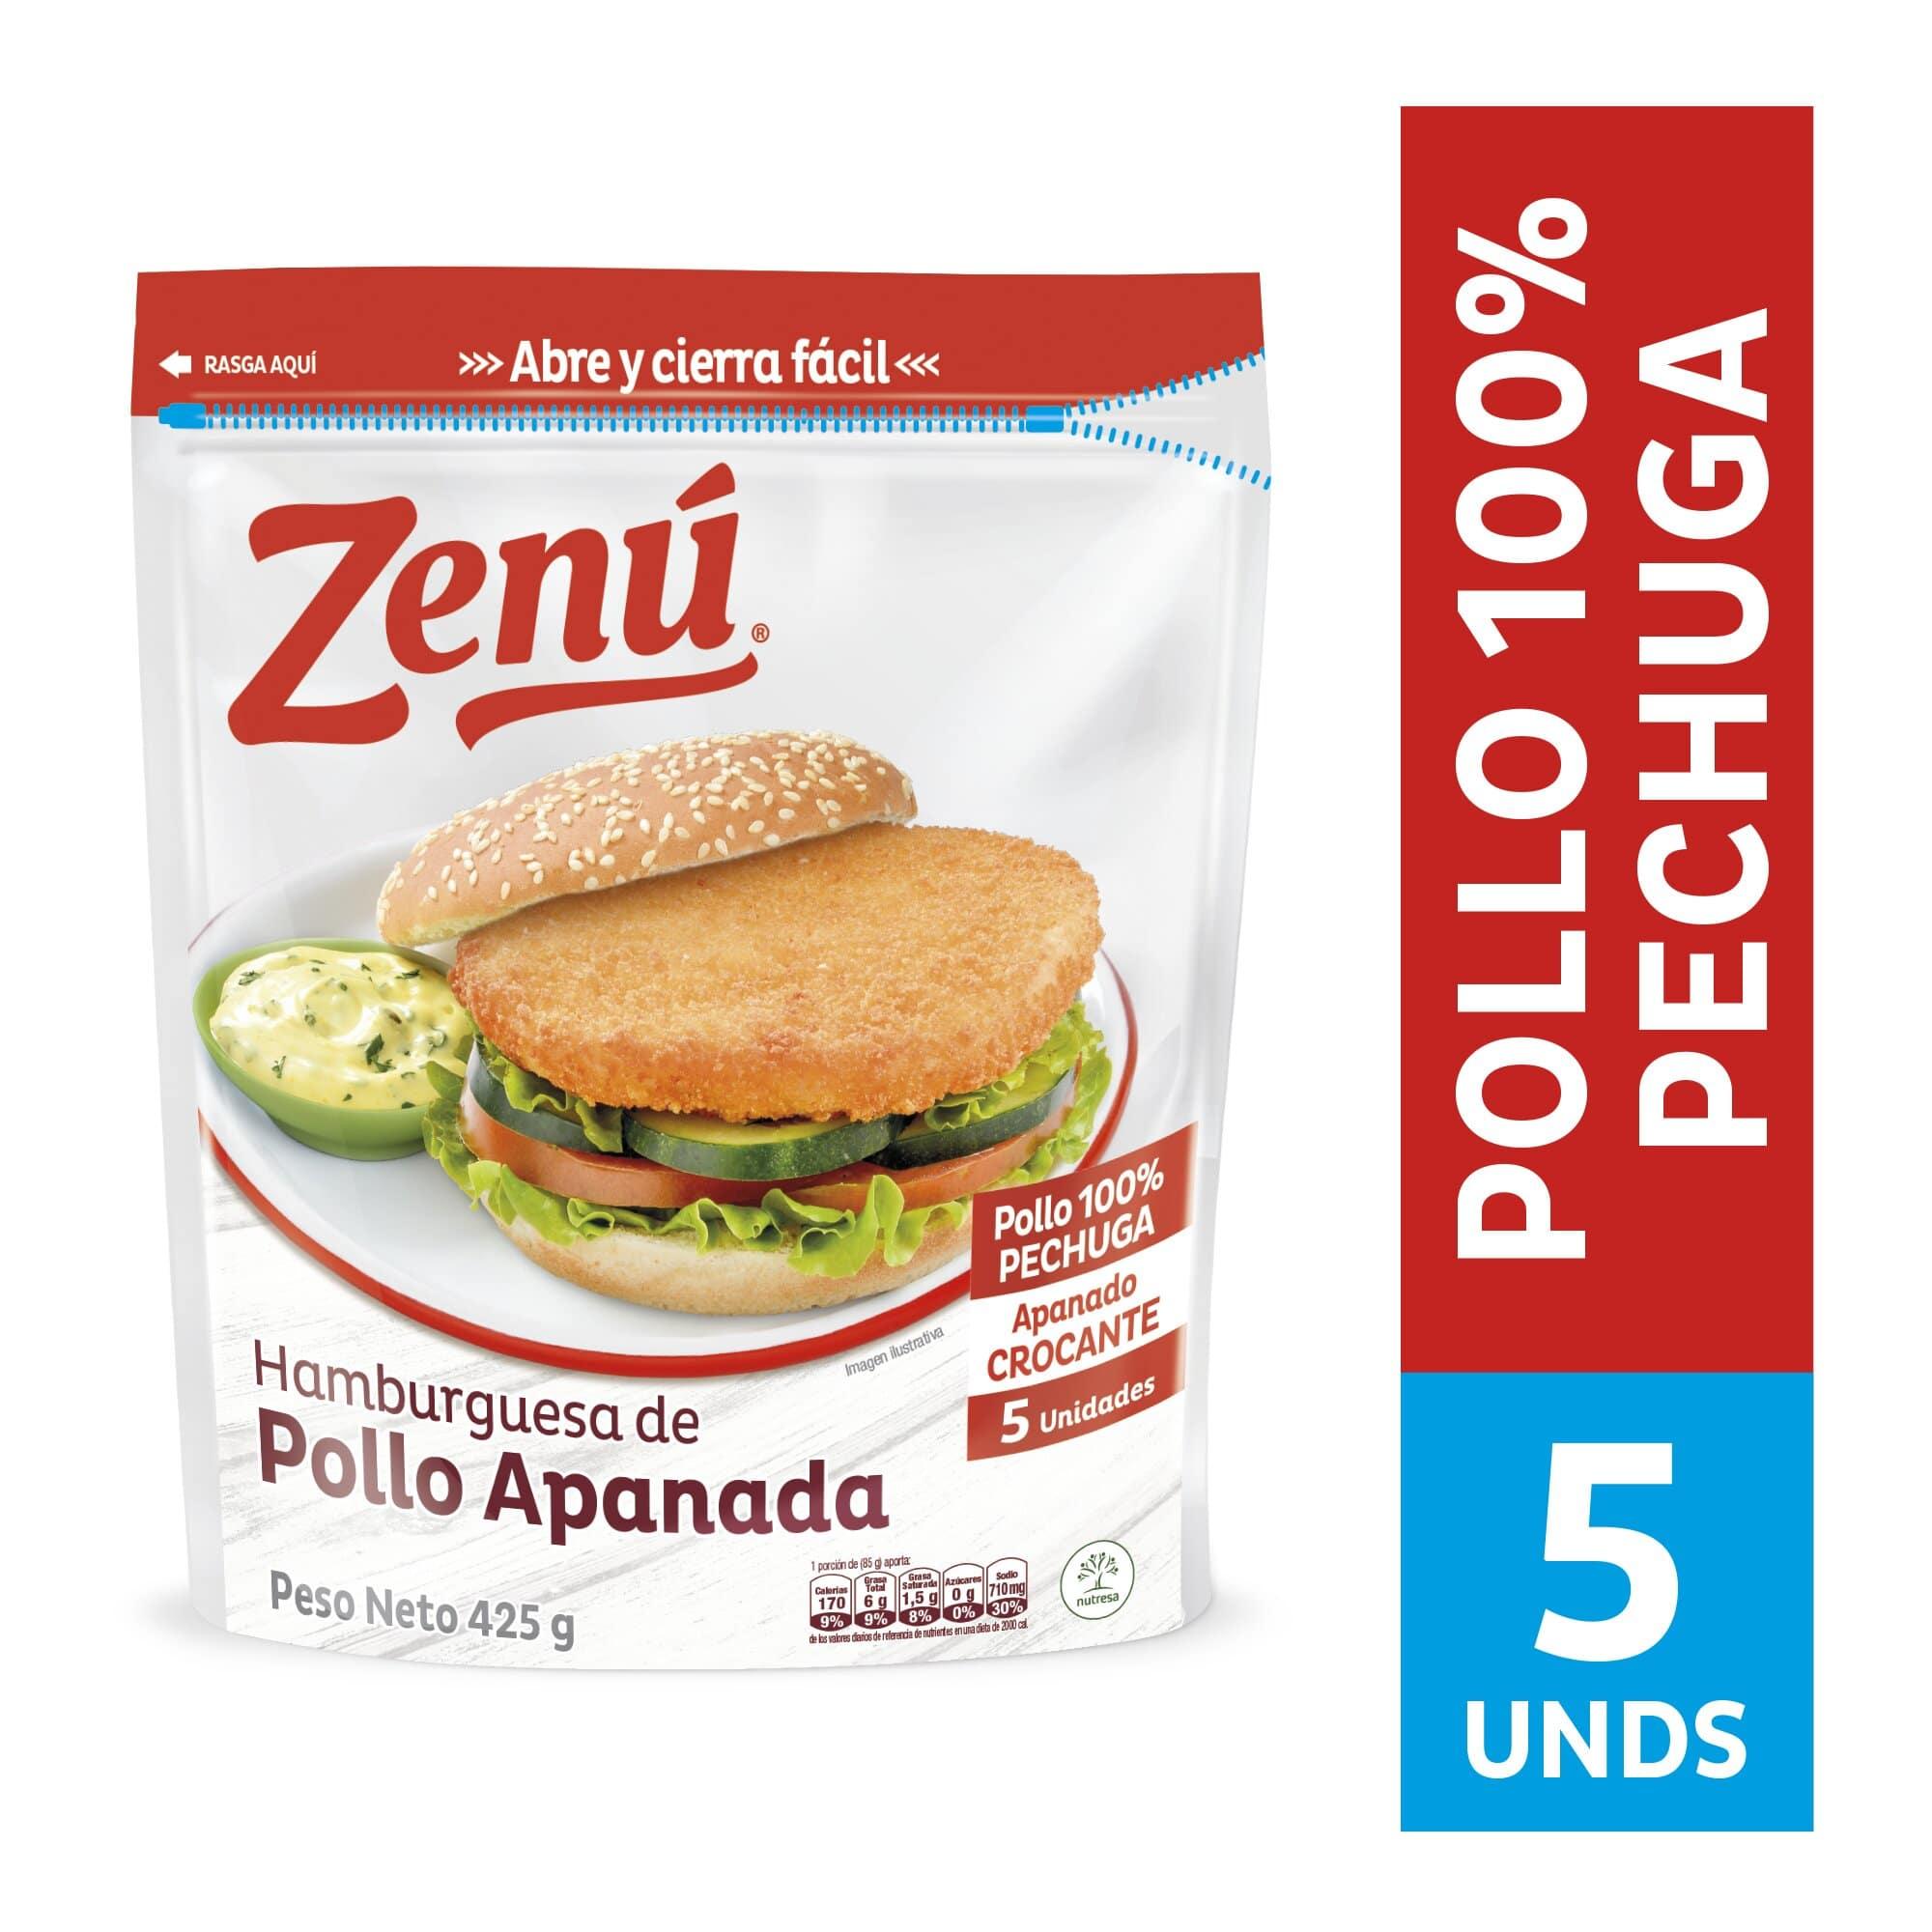 Hamburguesa Pollo Apanado Zenu 425g